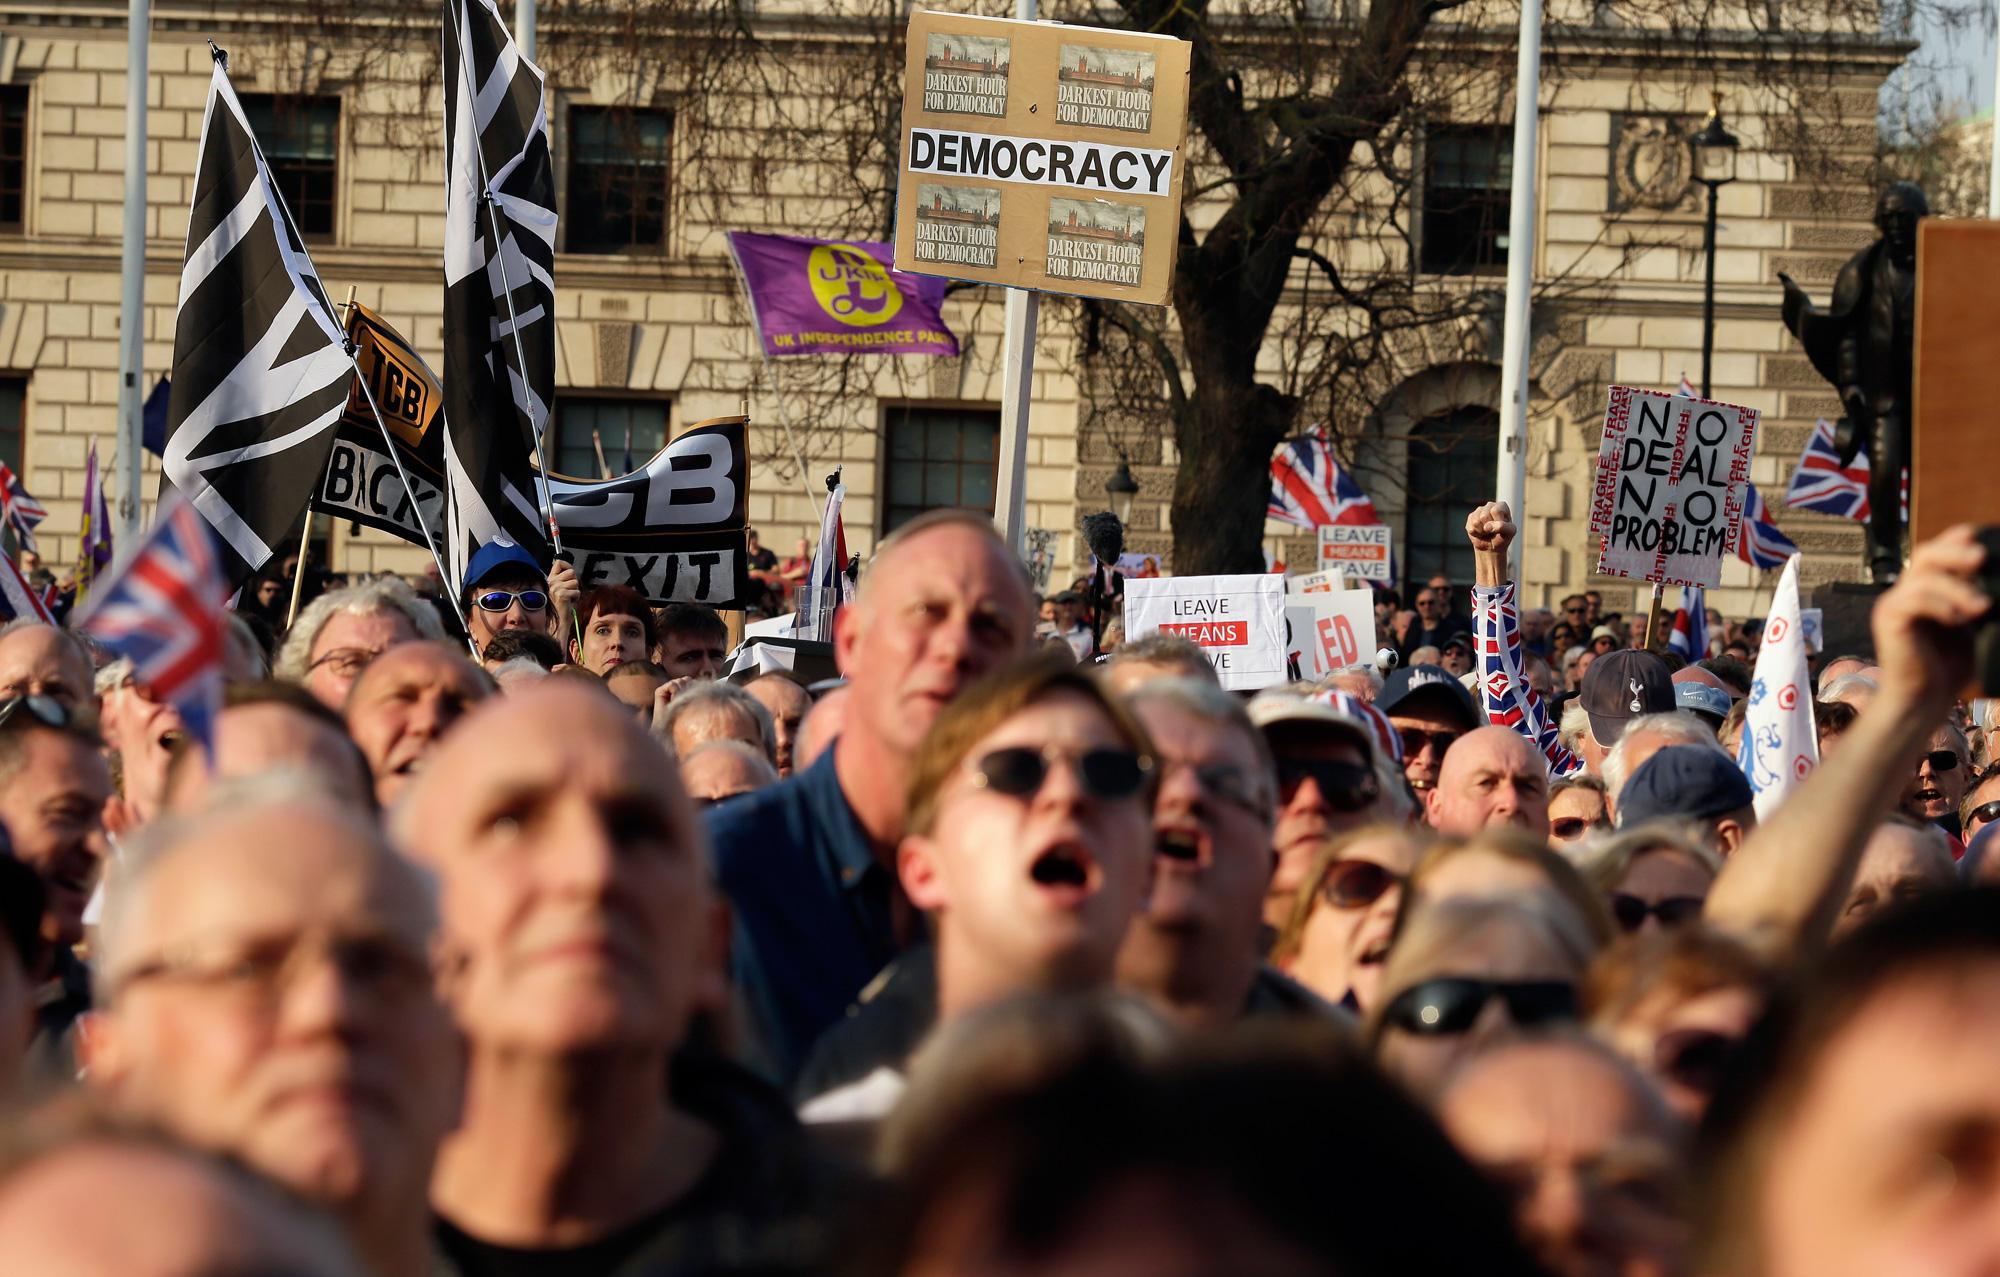 People 'have lost confidence in British democracy'